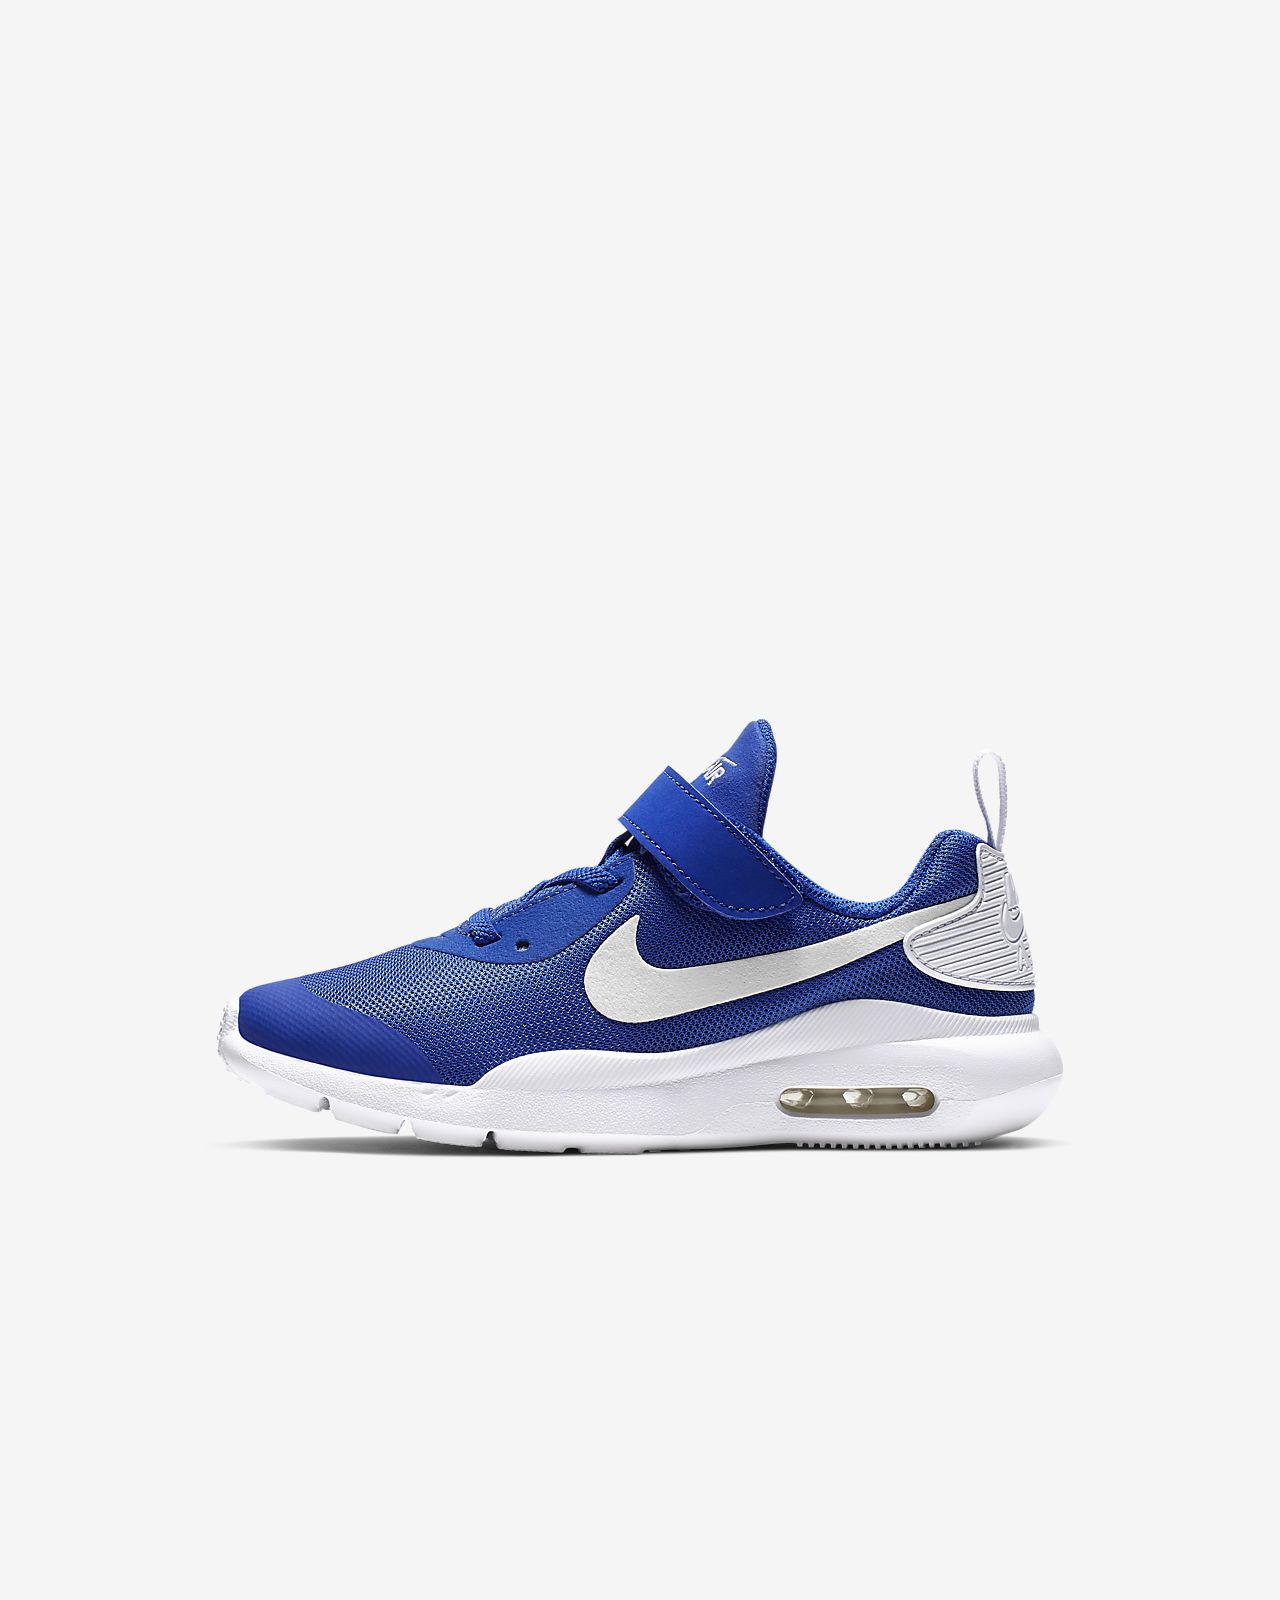 huge selection of 21625 8b66c ... Nike Air Max Oketo Little Kids  Shoe